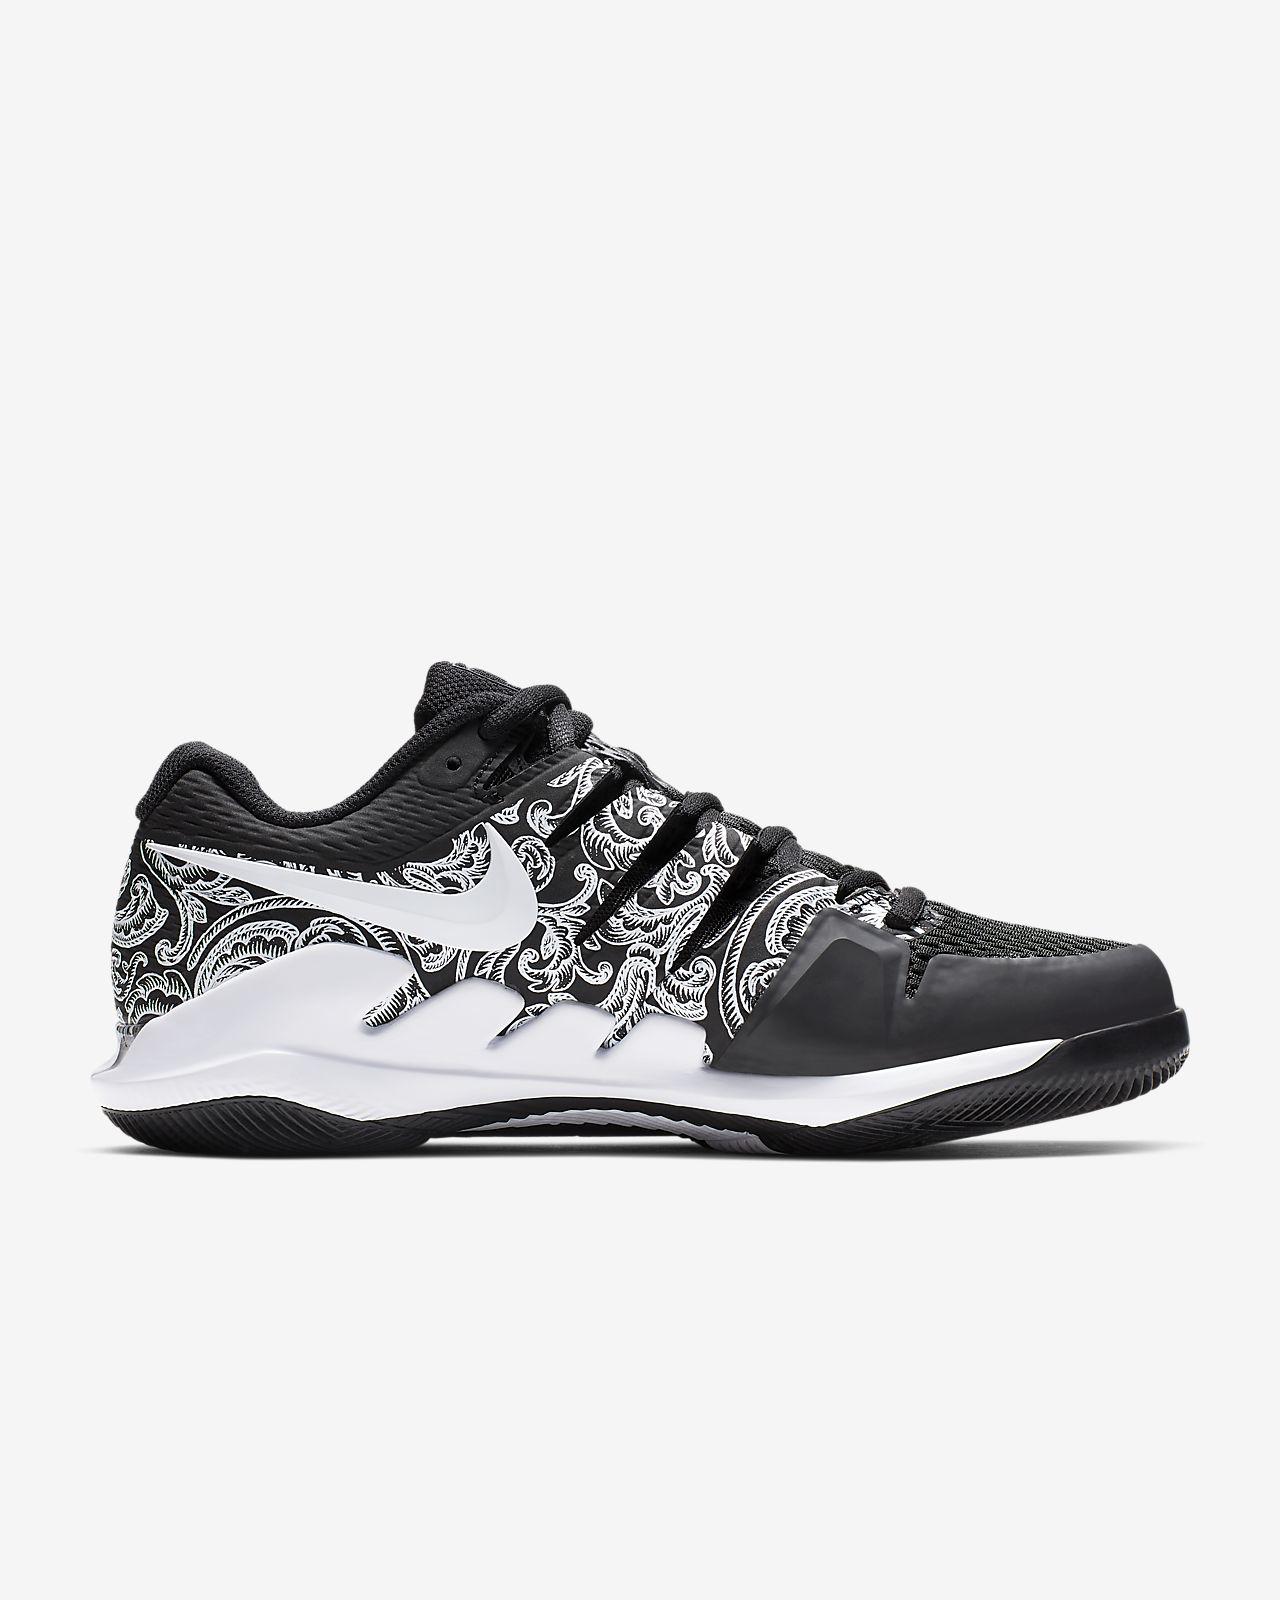 57c364d0ee NikeCourt Air Zoom Vapor X Women's Hard Court Tennis Shoe. Nike.com